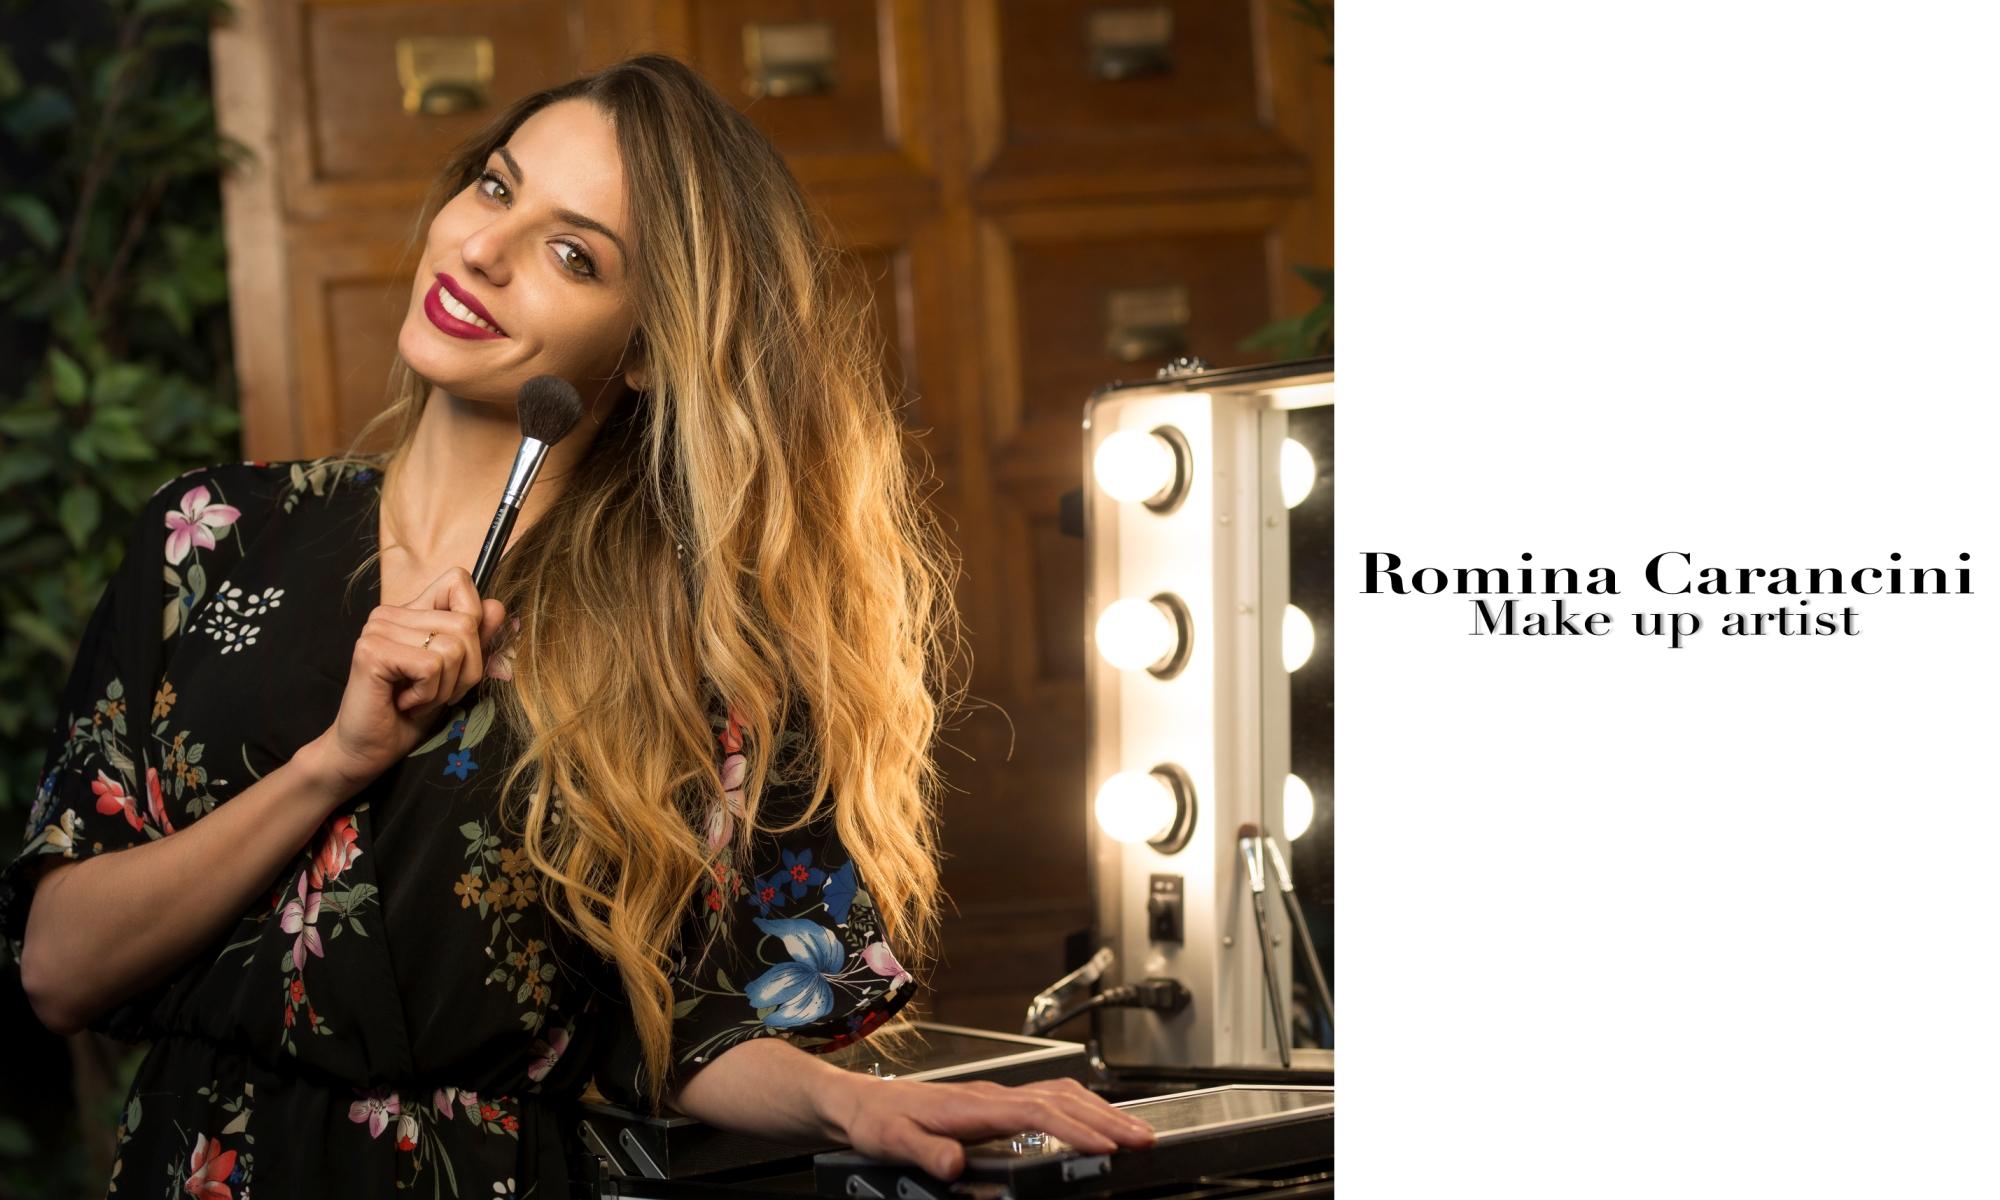 Romina Carancini